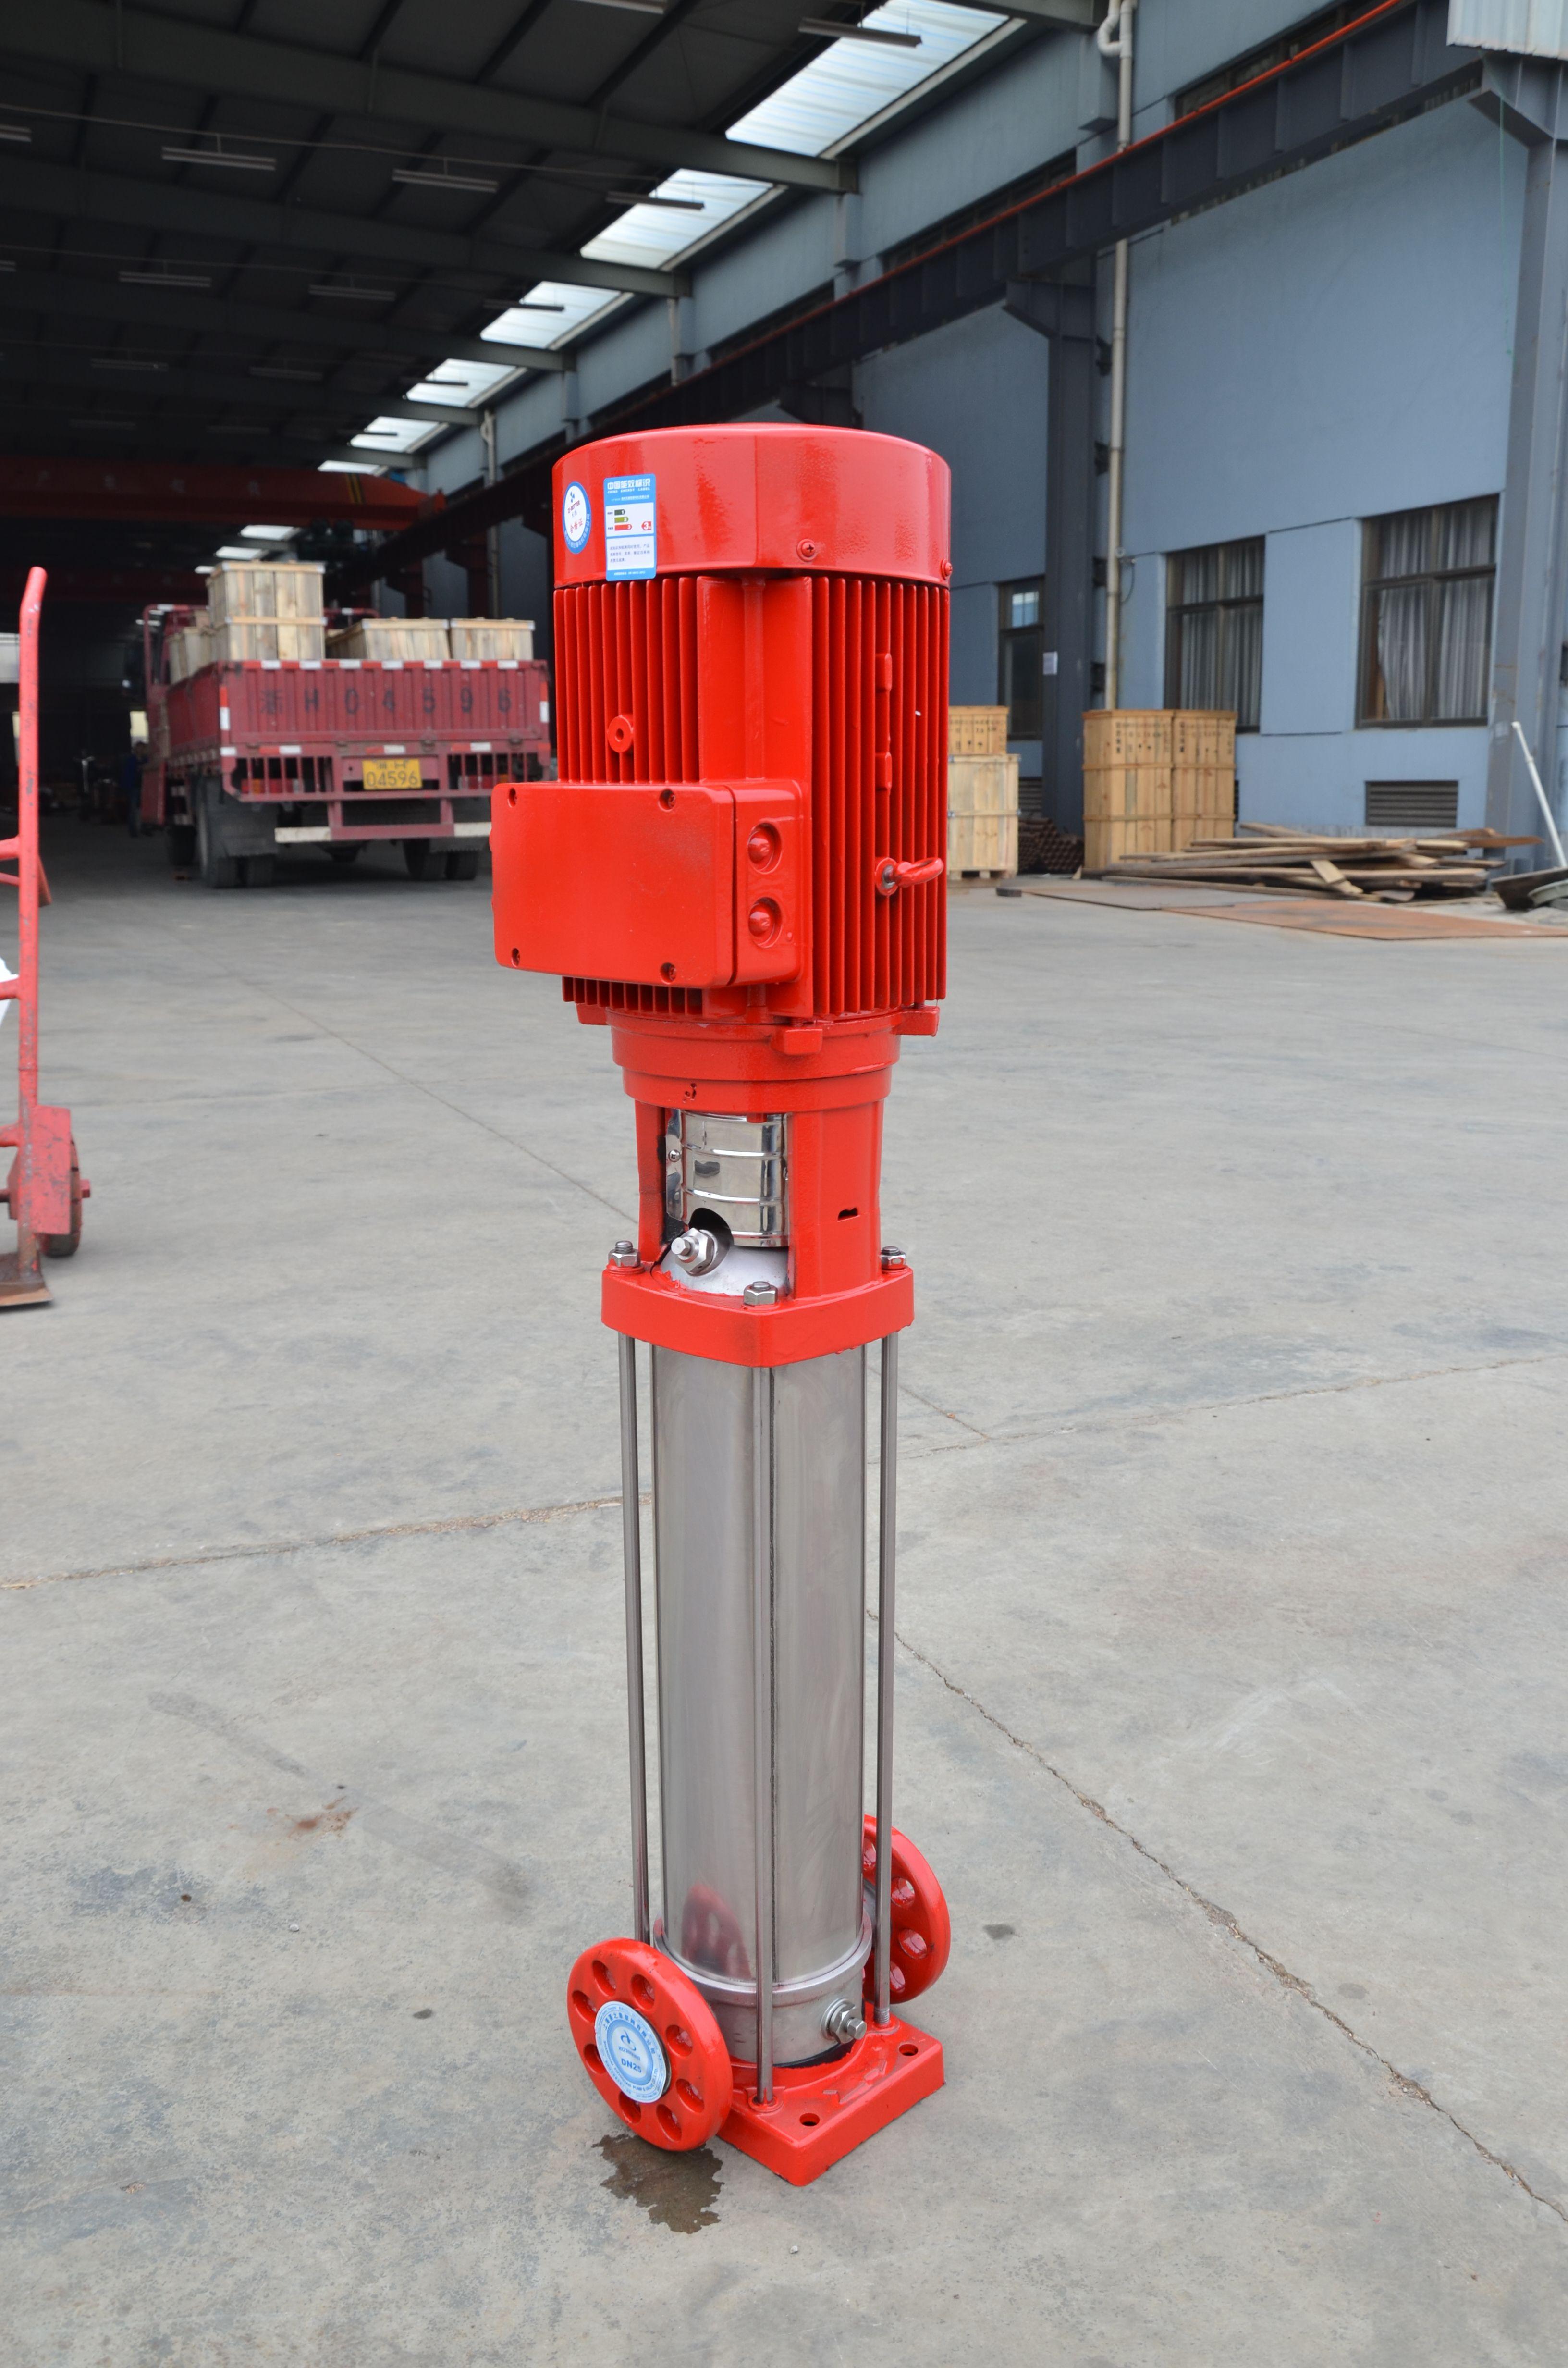 Vertical multistage fire pump | pumps firepumps | Kitchen